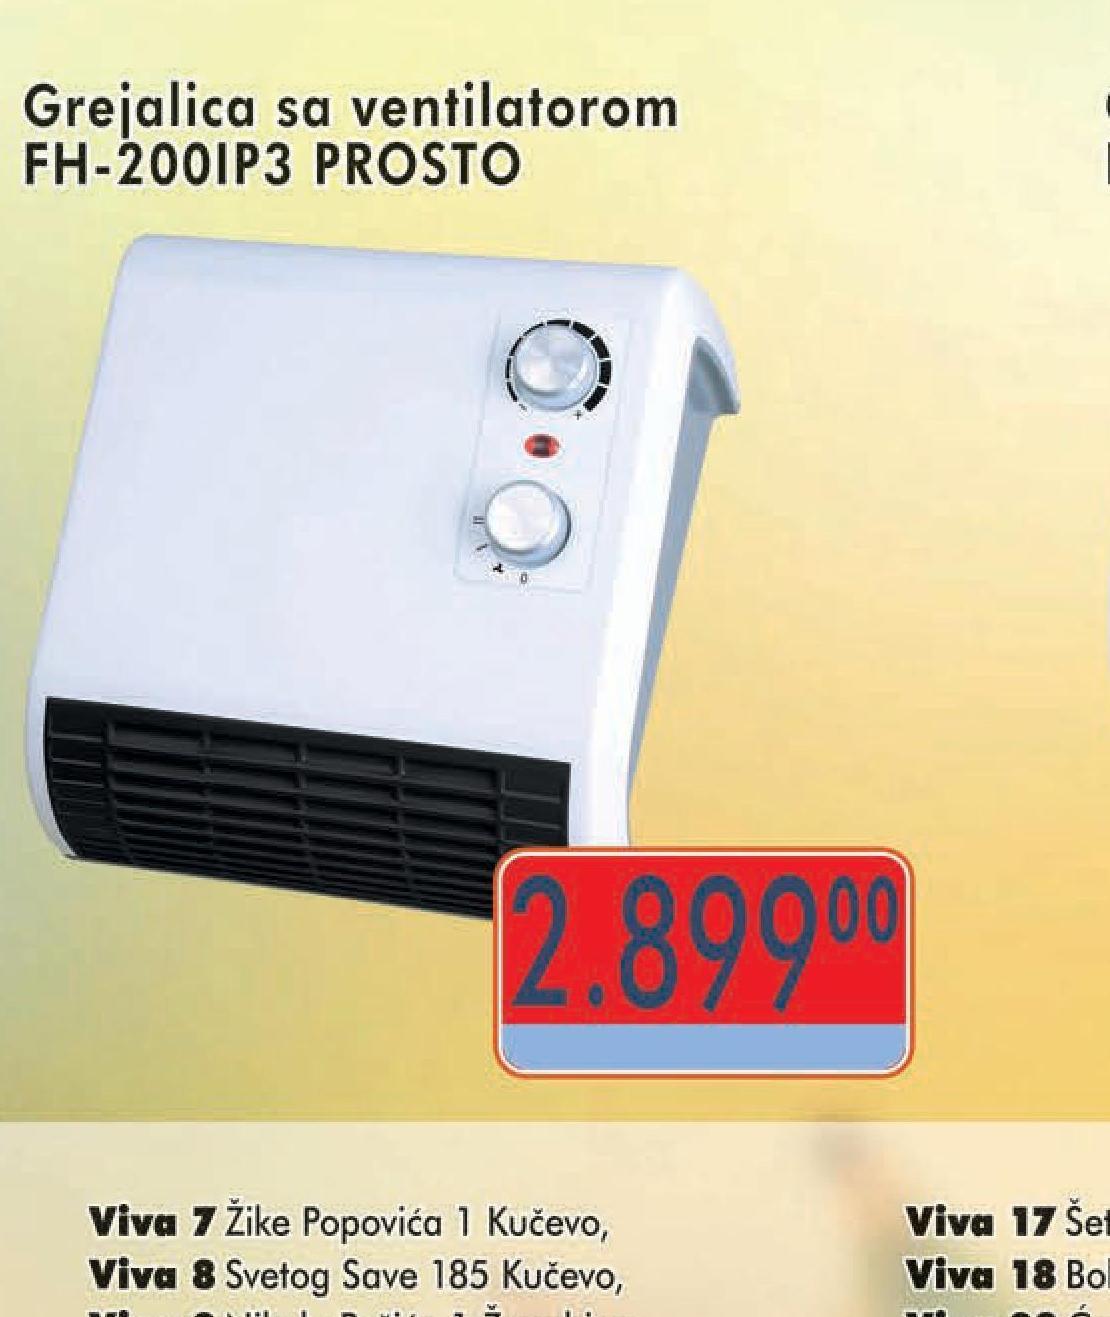 Grejalica FH 200IP3